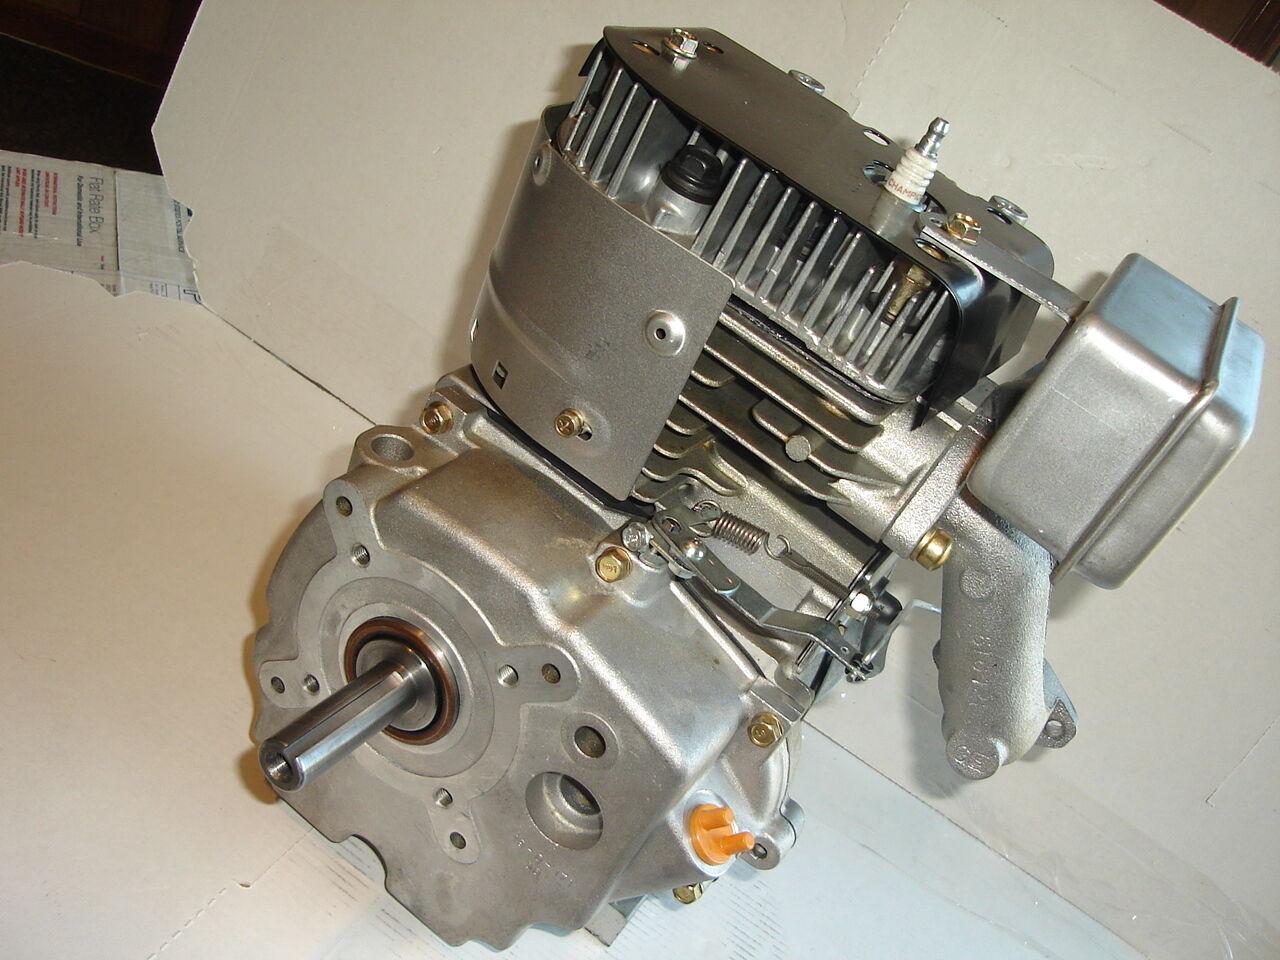 8 5 hp Tecumseh Snowblower Engine Manual